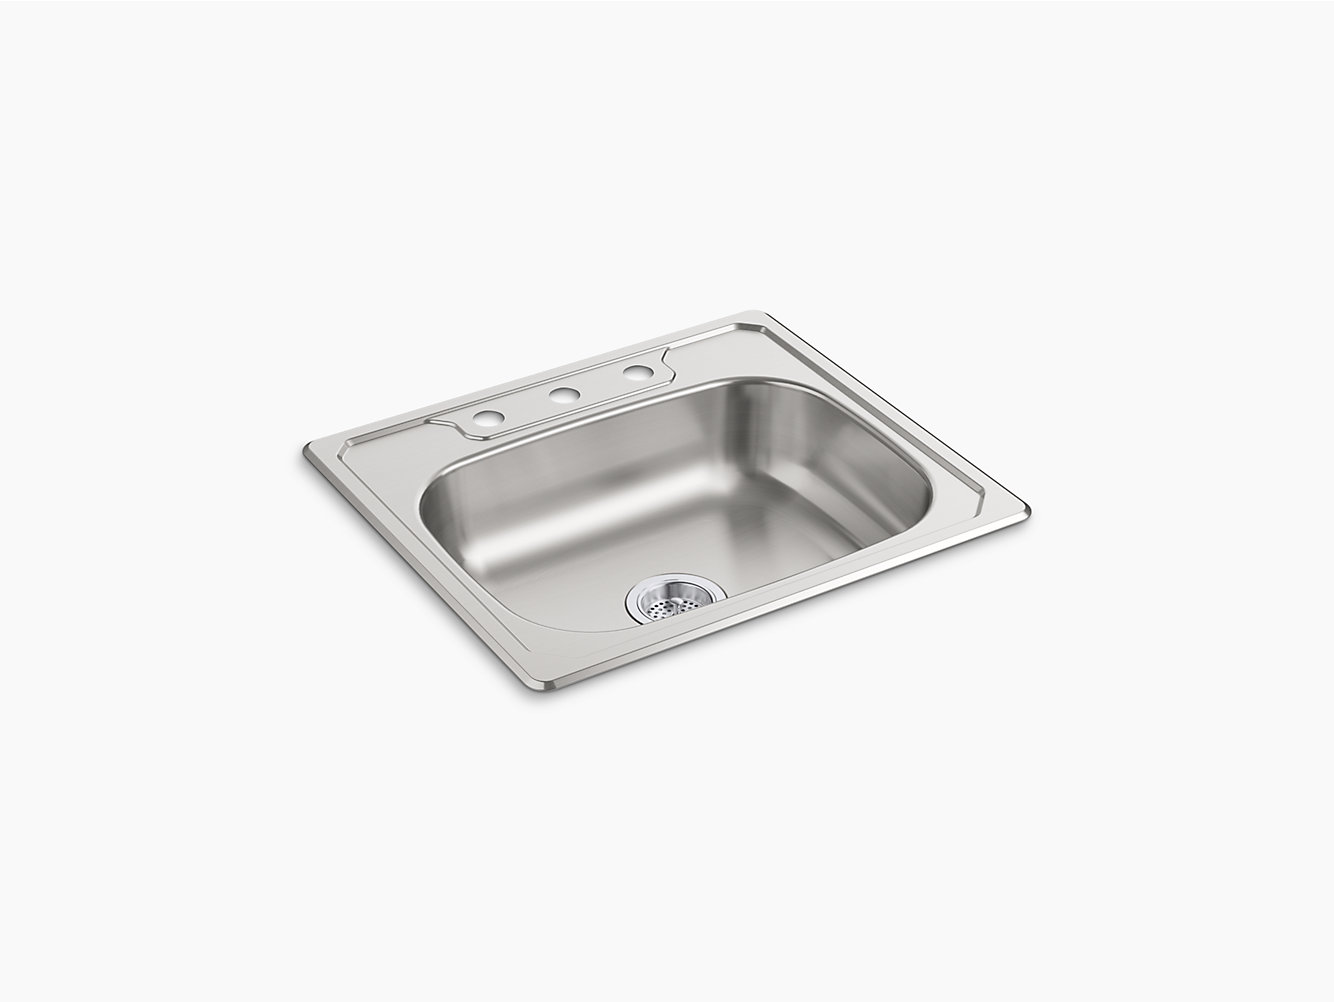 Middleton top mount single bowl kitchen sink 25 x 22 x 6 14631 middleton top mount single bowl kitchen sink 25 x 22 x 6 14631 3 na sterling workwithnaturefo